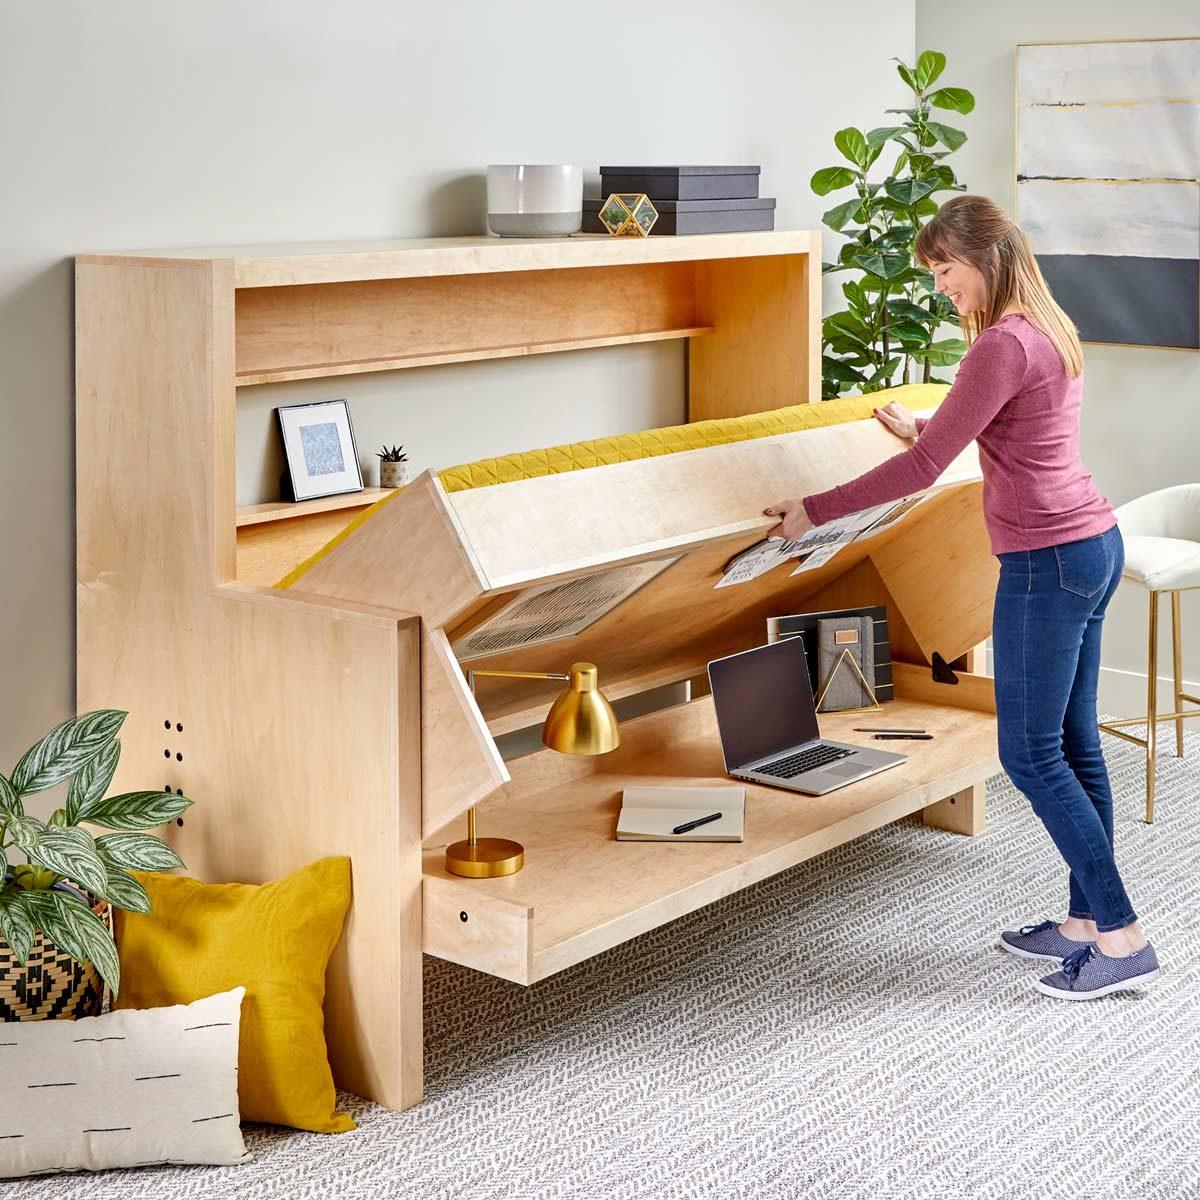 furnish-an-attic-spending-little-13